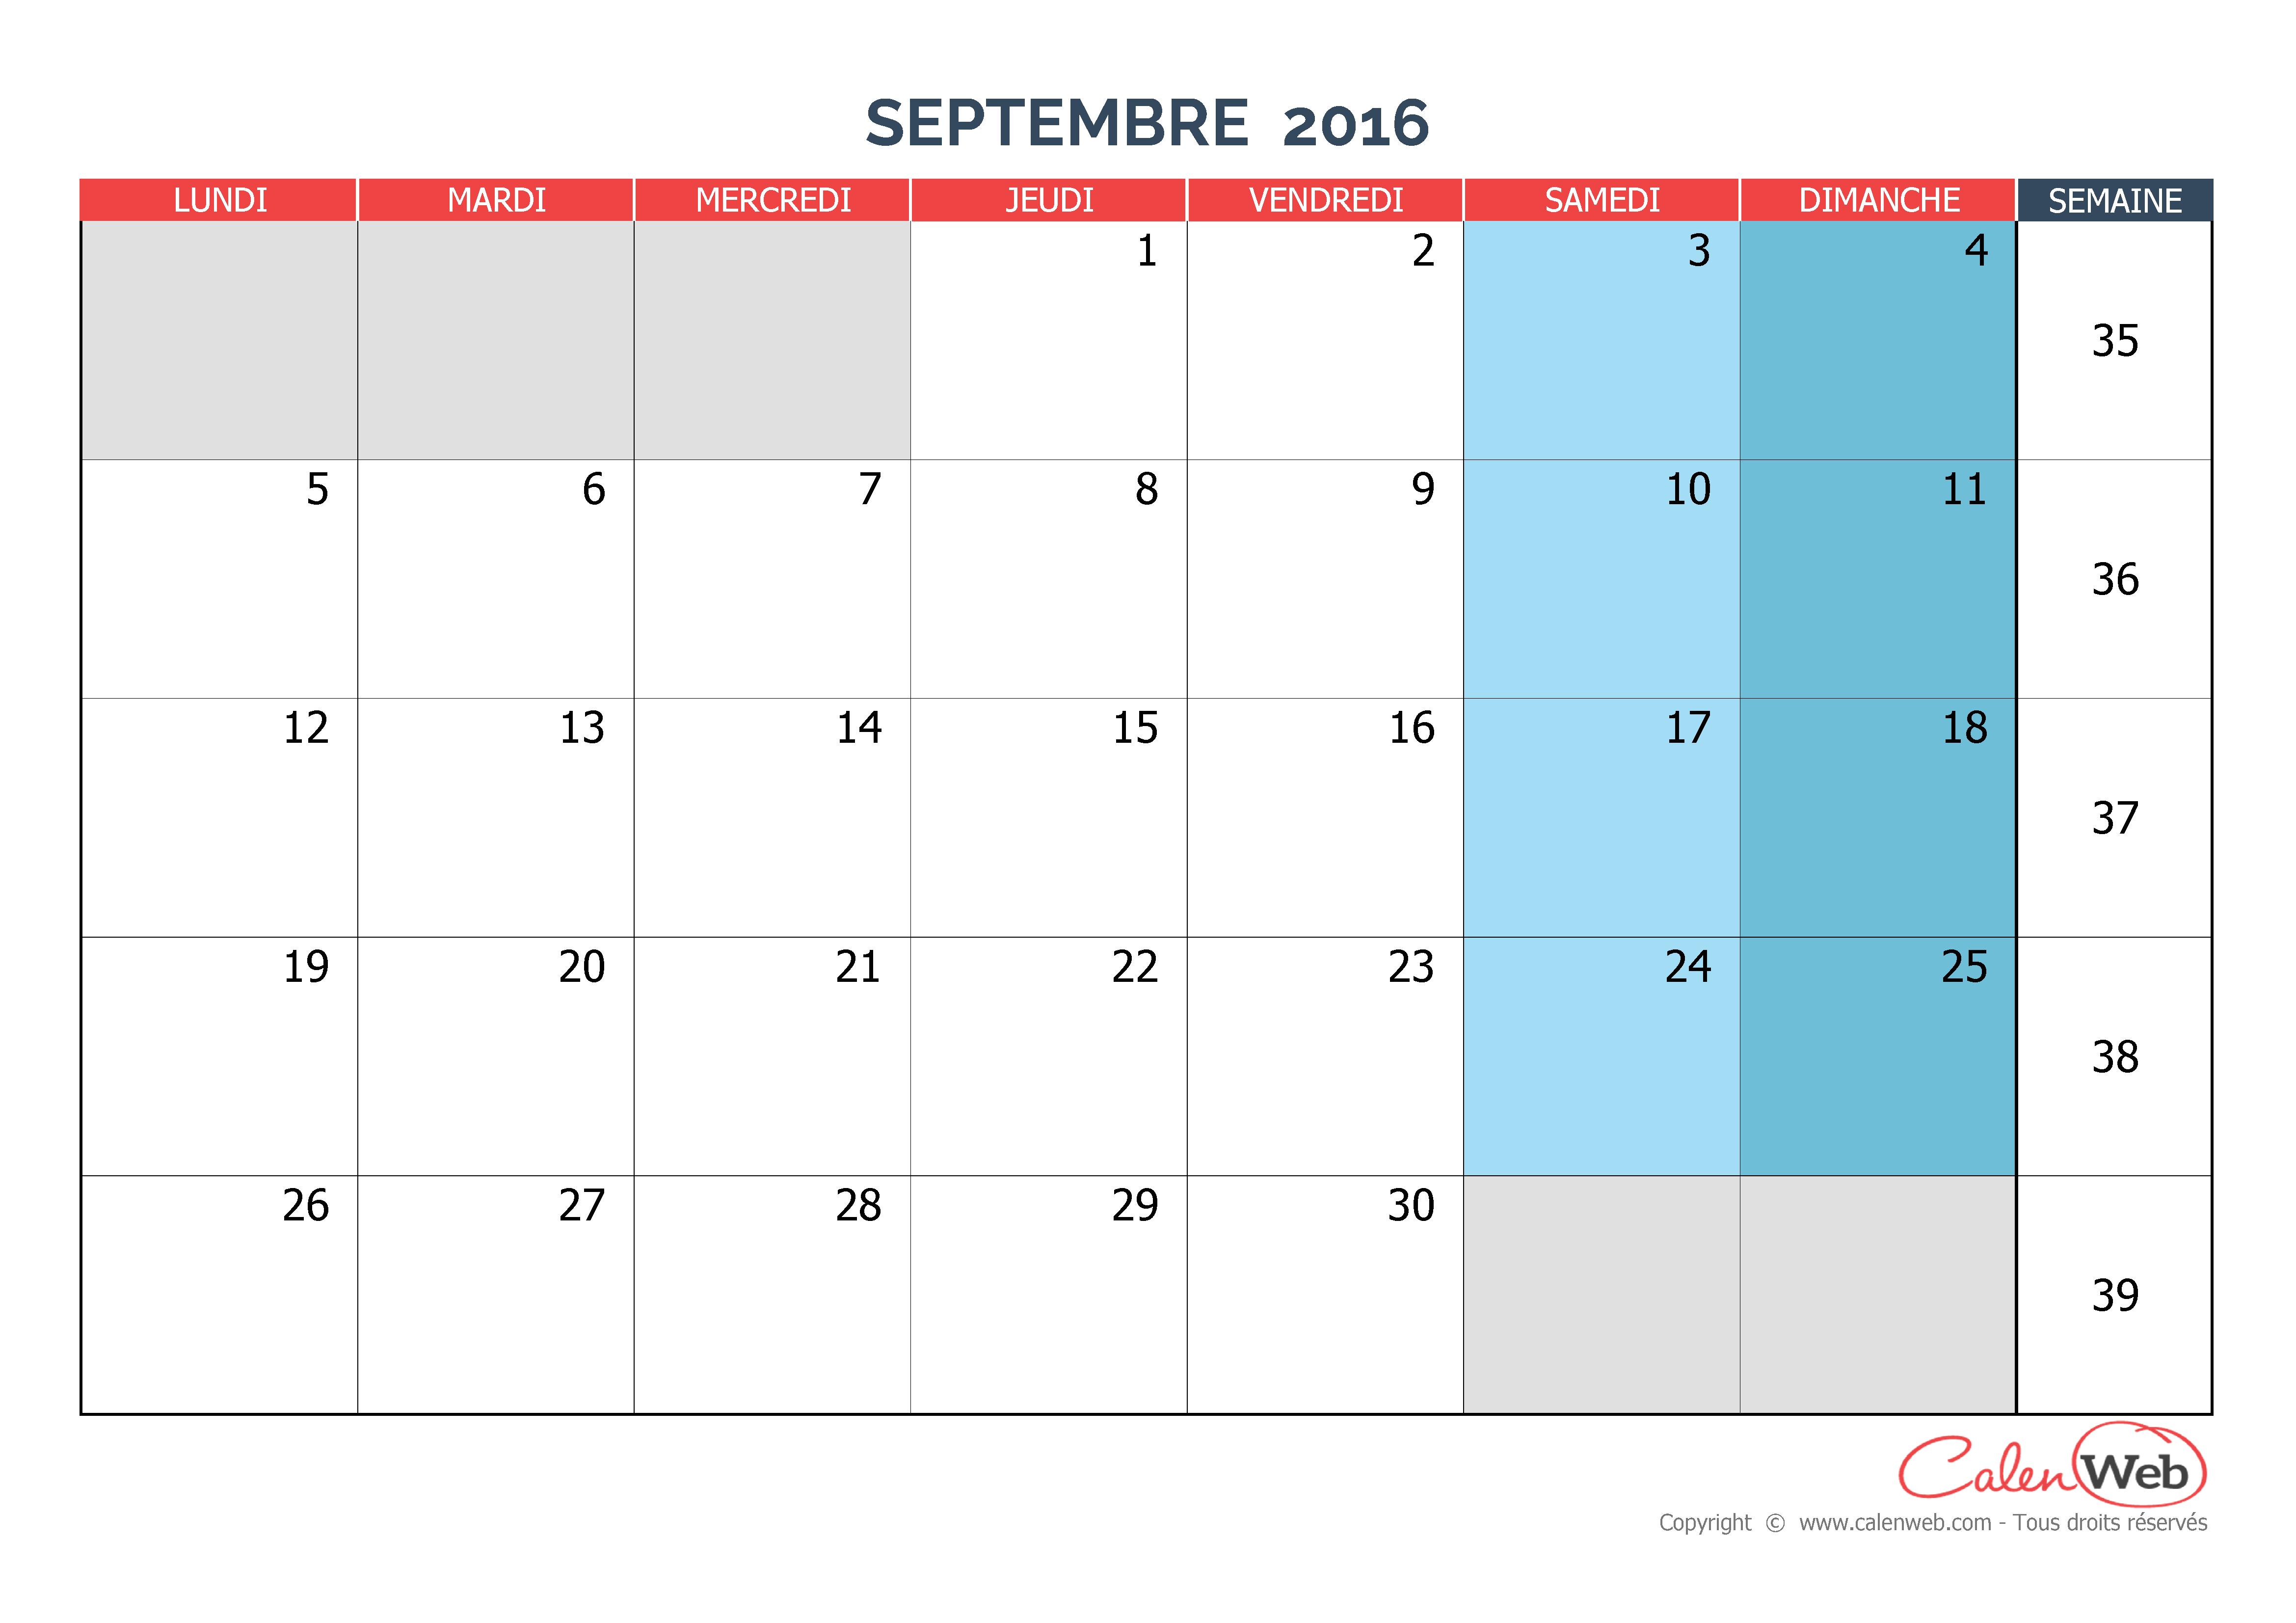 Calendrier mensuel - Mois de septembre 2016 Version vierge - Calenweb ...